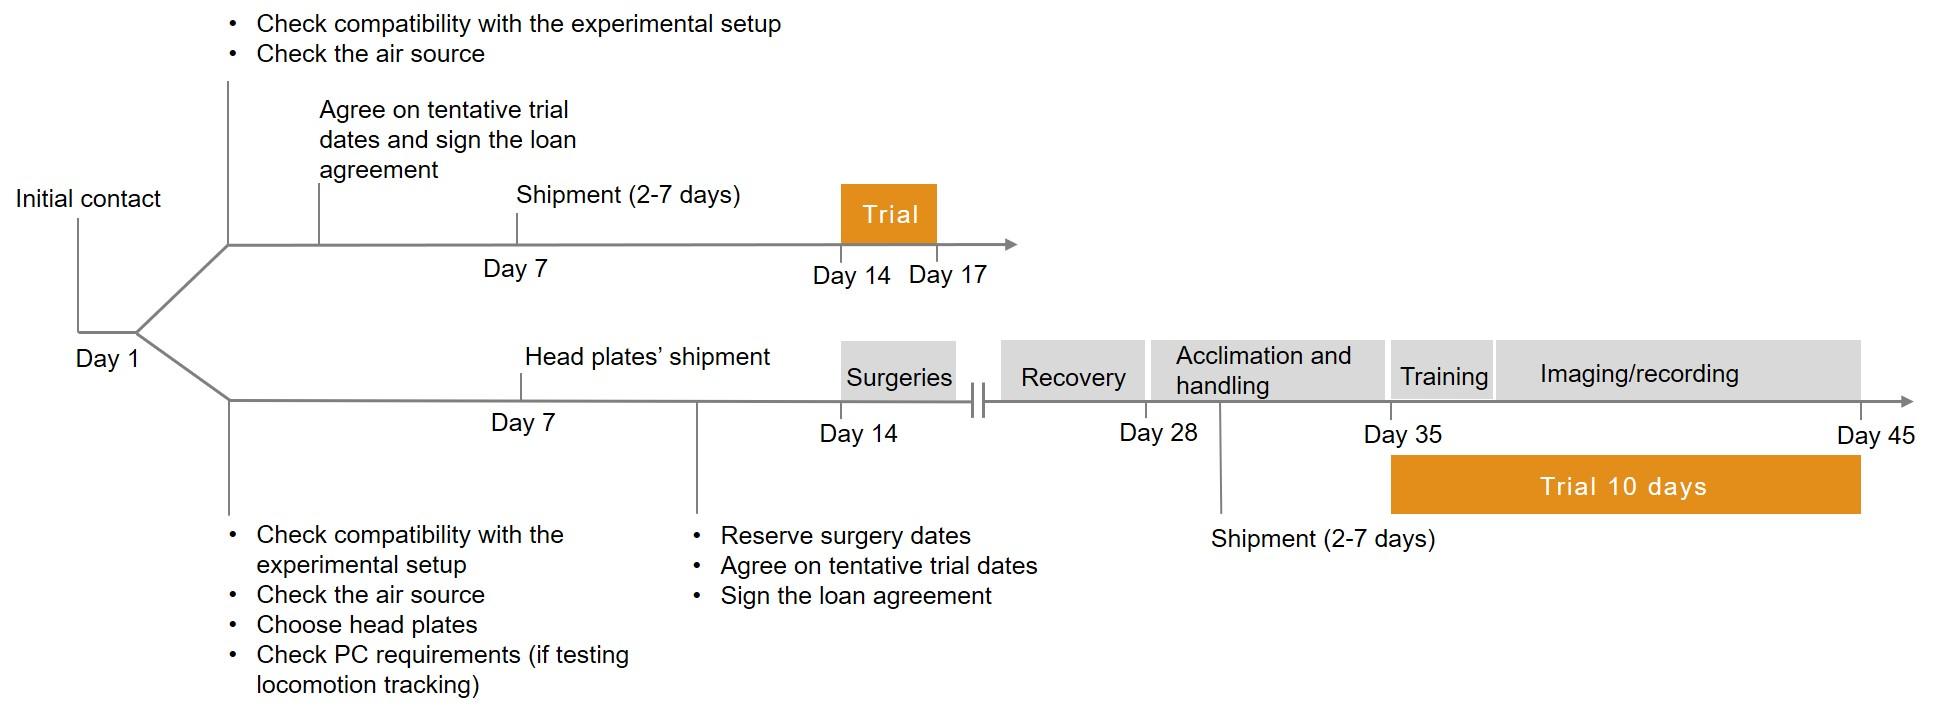 Trial timeline for Mobile HomeCage trials